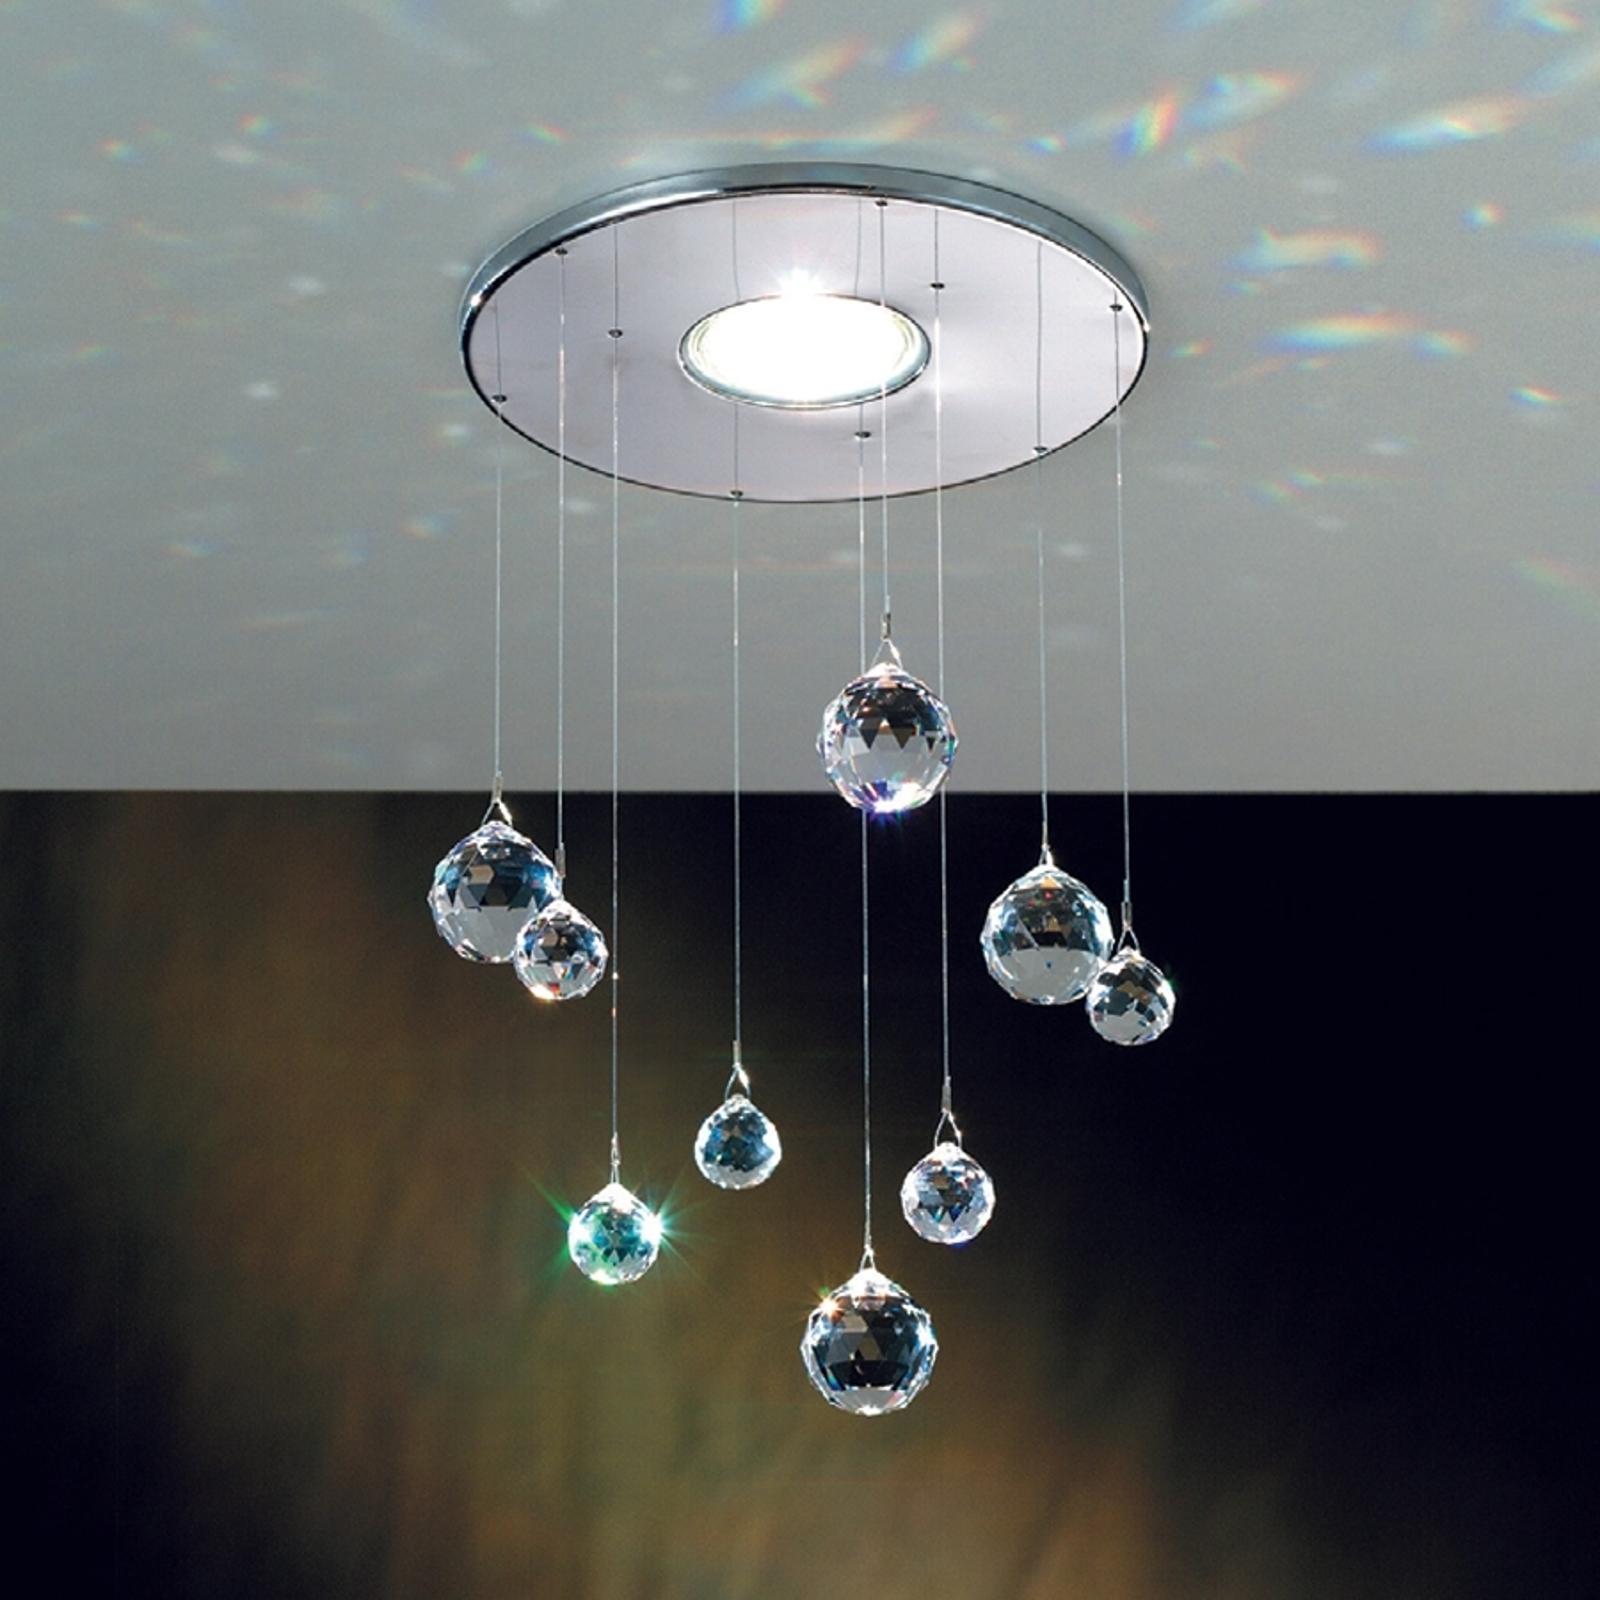 Einbaulampe Feng Shui mit Swarovski Elements chrom